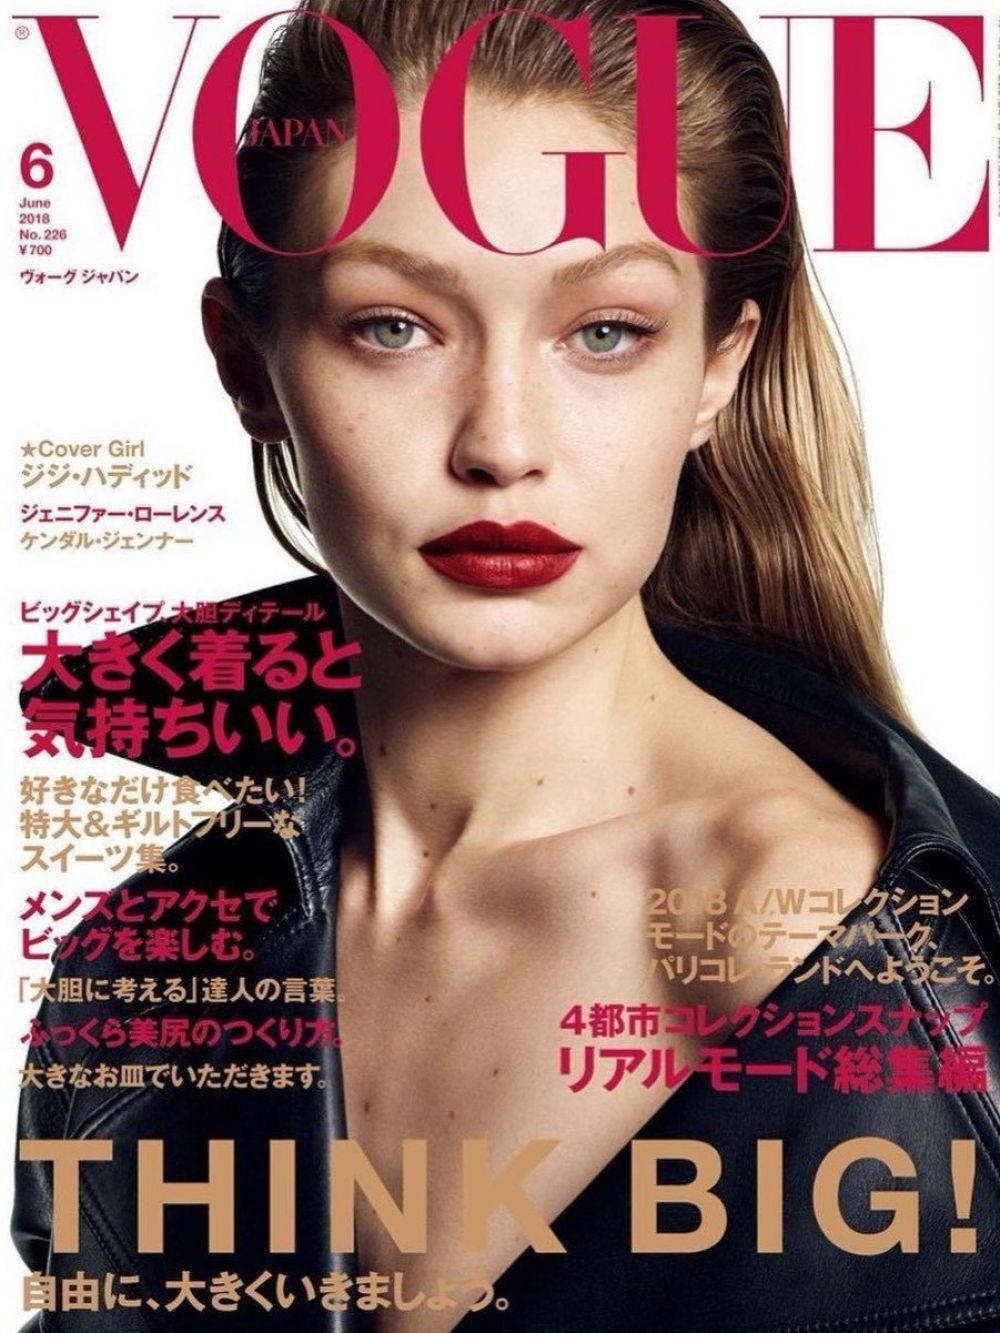 Vogue Magazine Uk May 2015 Issue: GIGI HADID In Vogue Magazine, Japan June 2018